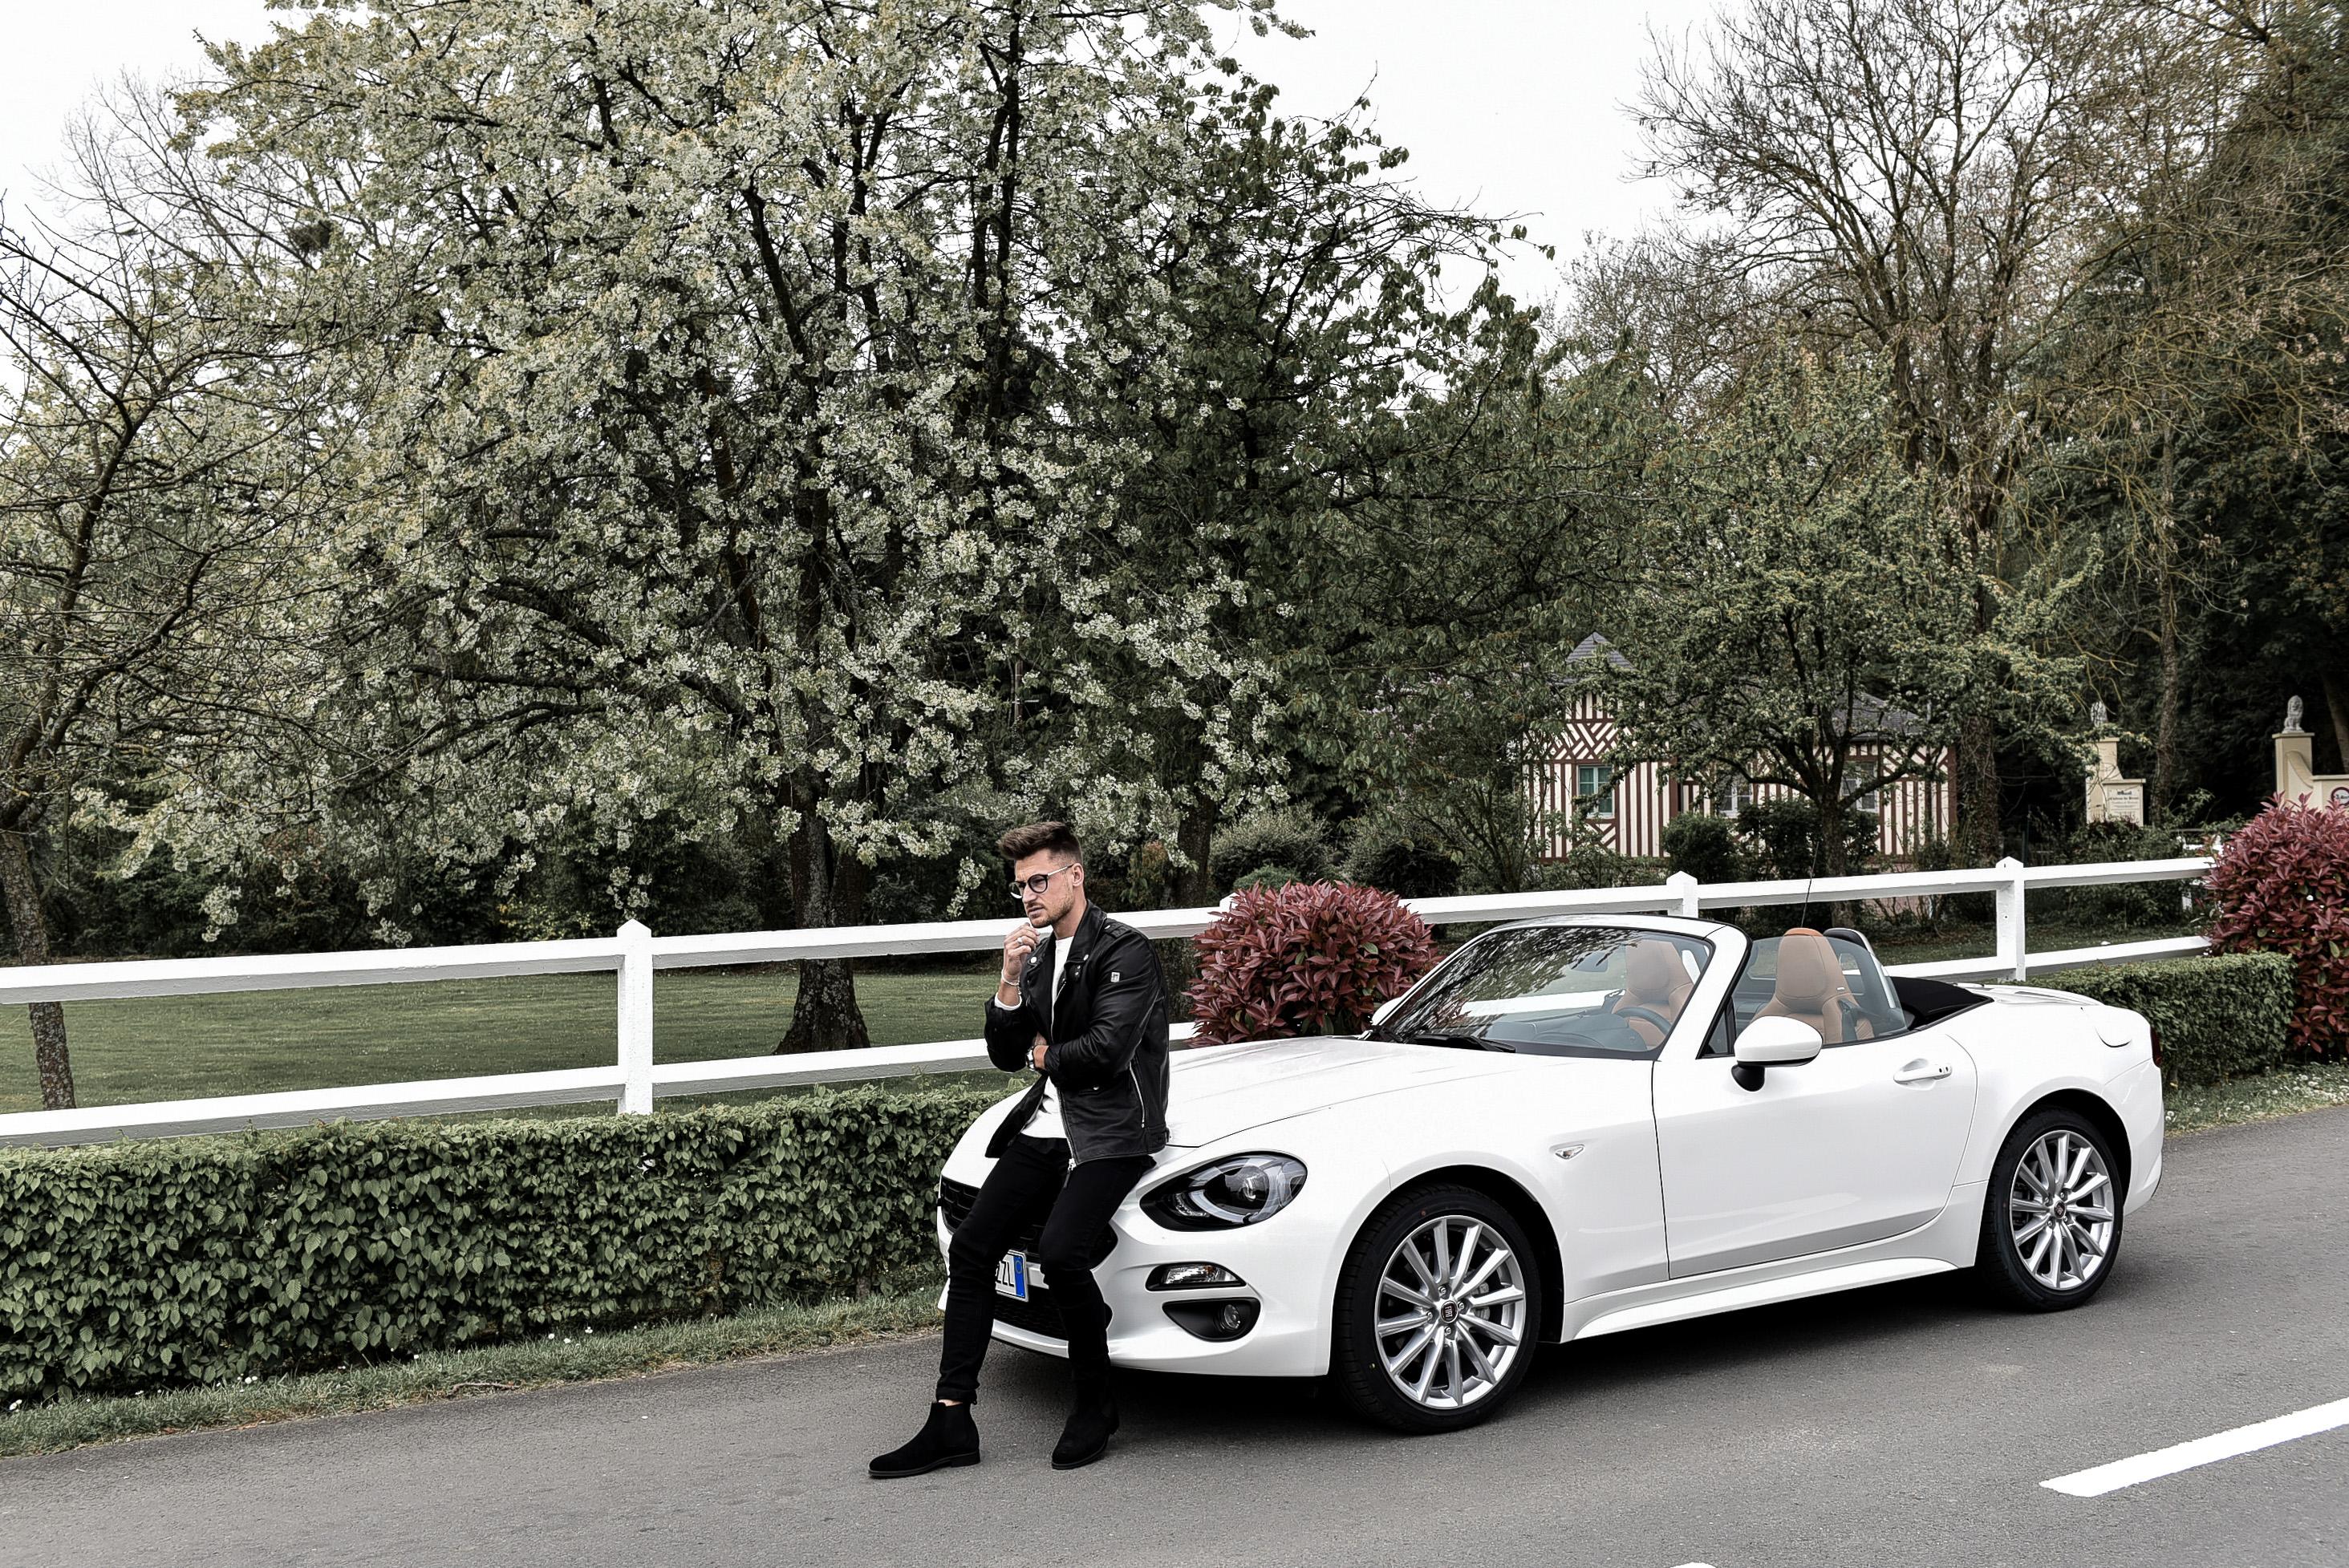 Tommeezjerry-Maennermodeblog-Maennermode-Fashionblog-Styleblog-Berlinblog--Lifestyleblog-Fiat-124-Spider-Roadtrip-France-Normandy-Paris-Deauville